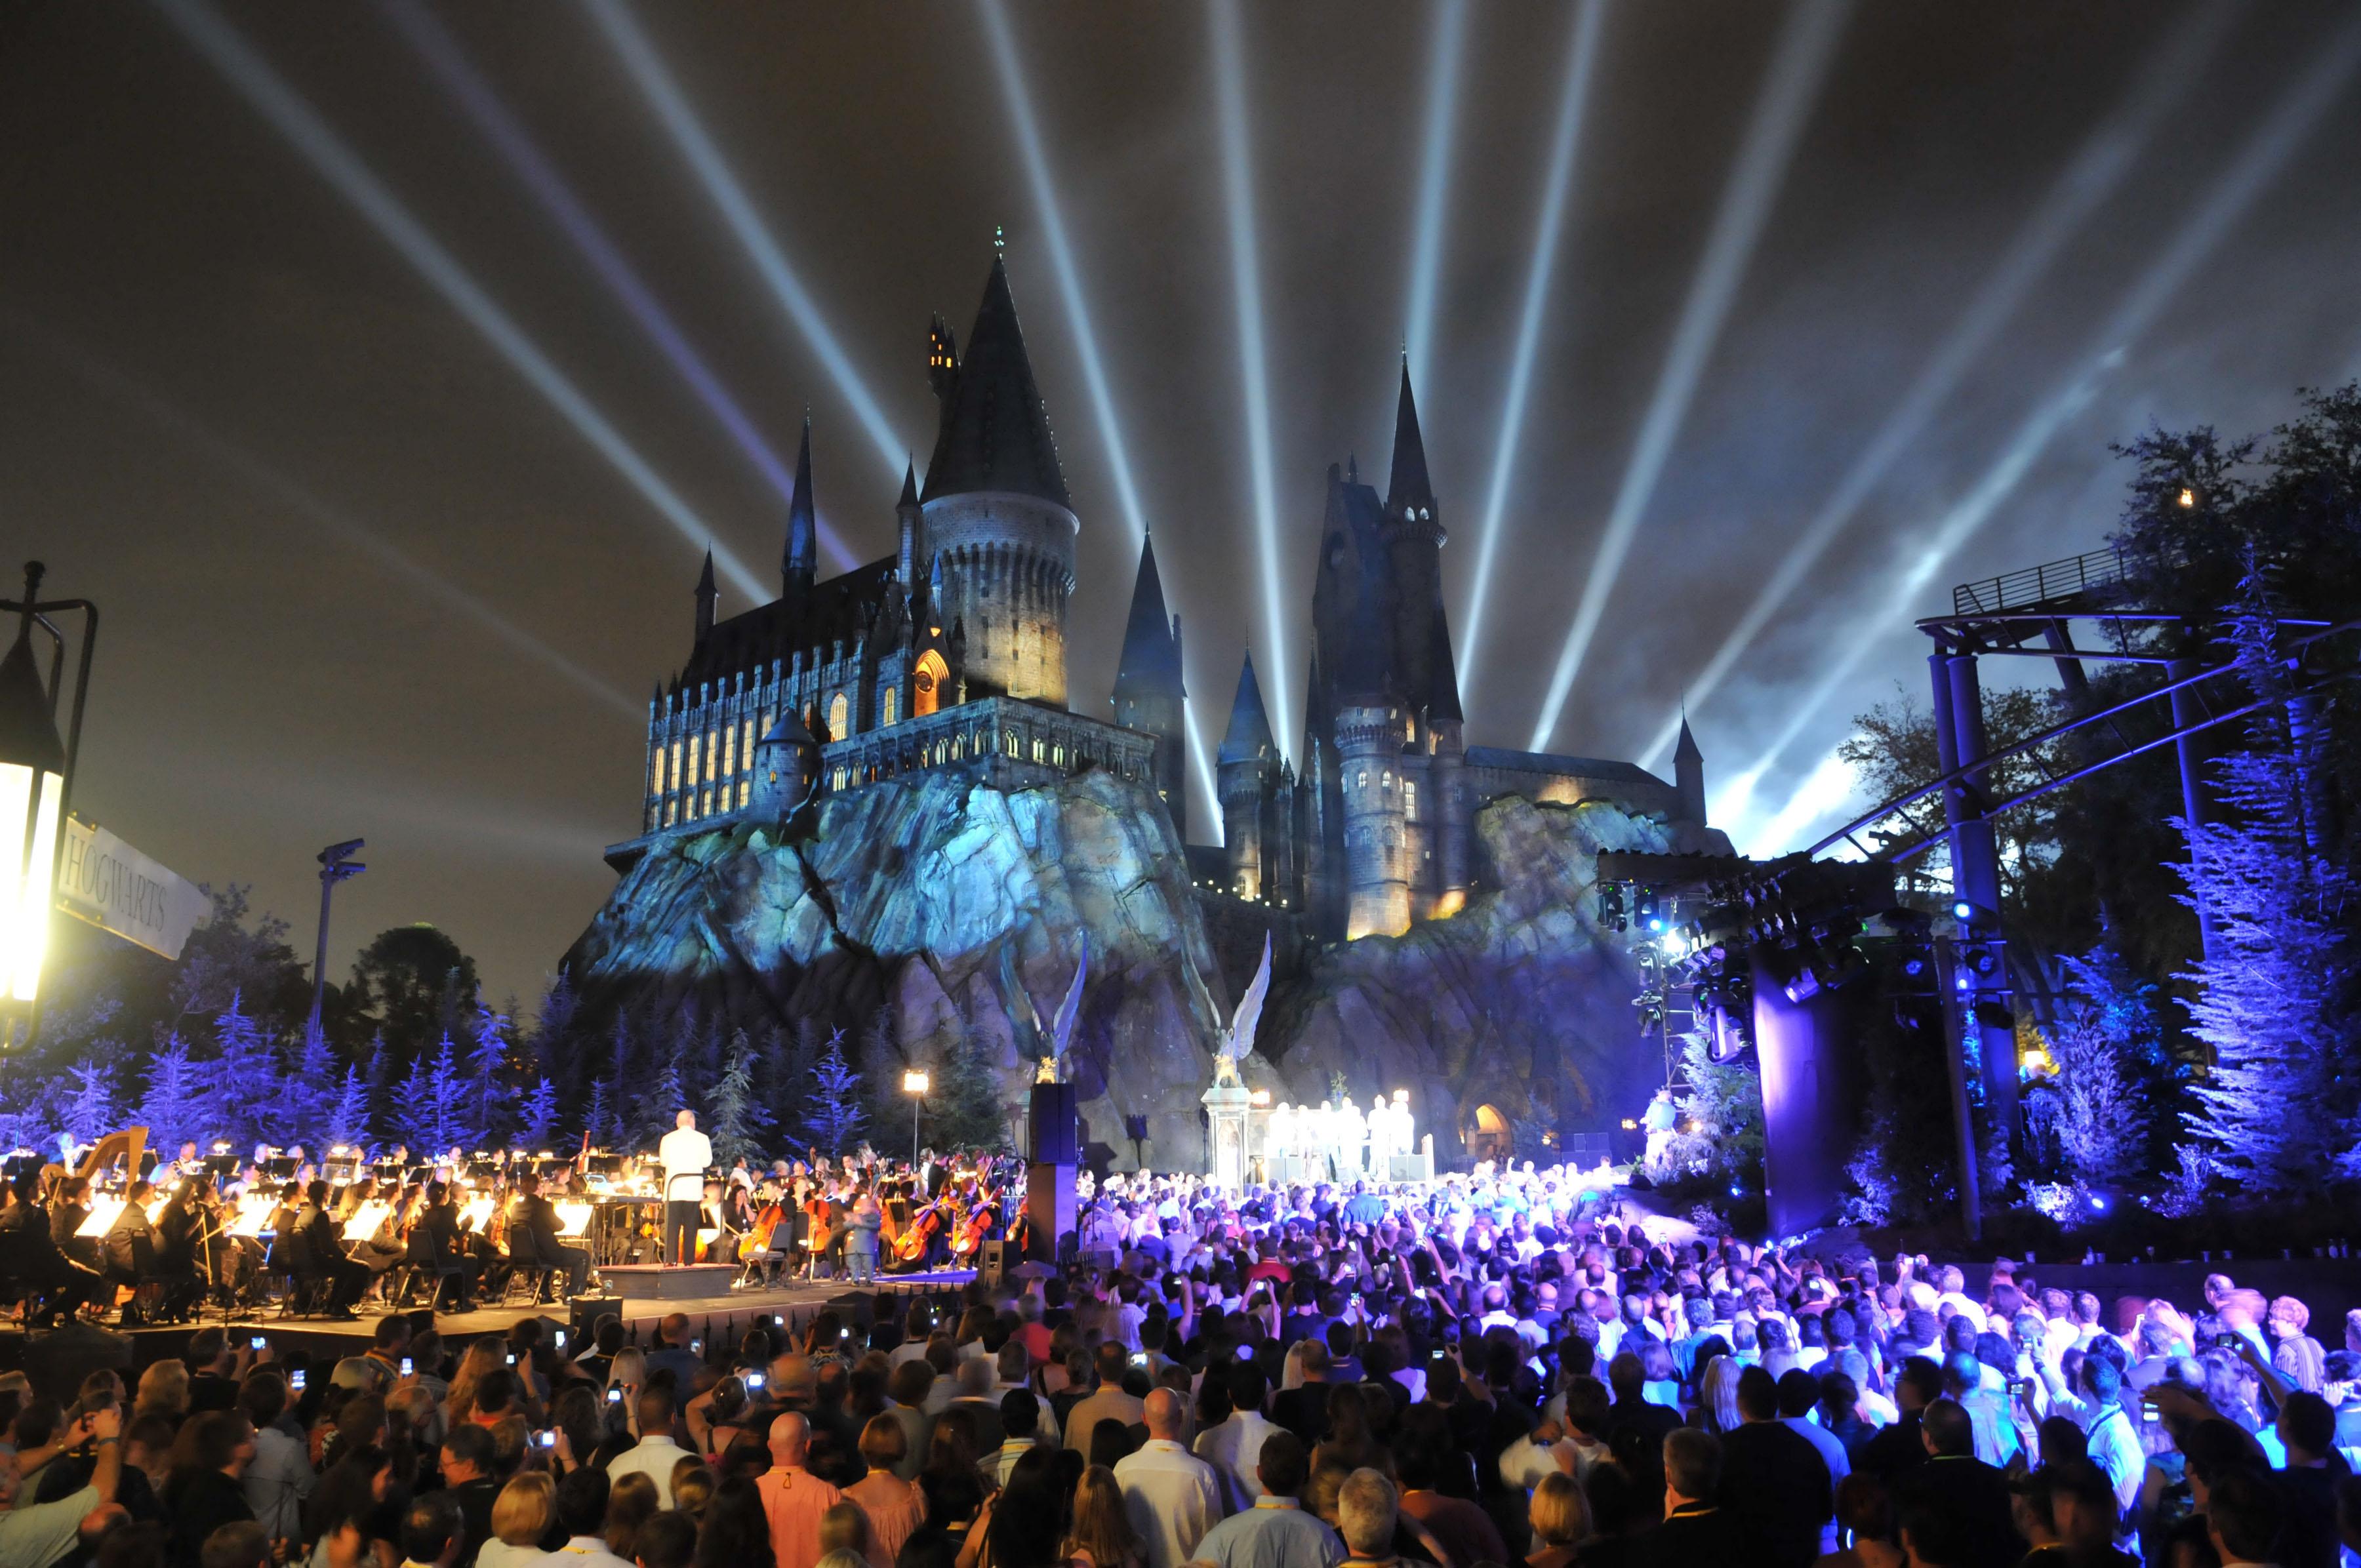 Iphone Background Lock Screen Harry Potter